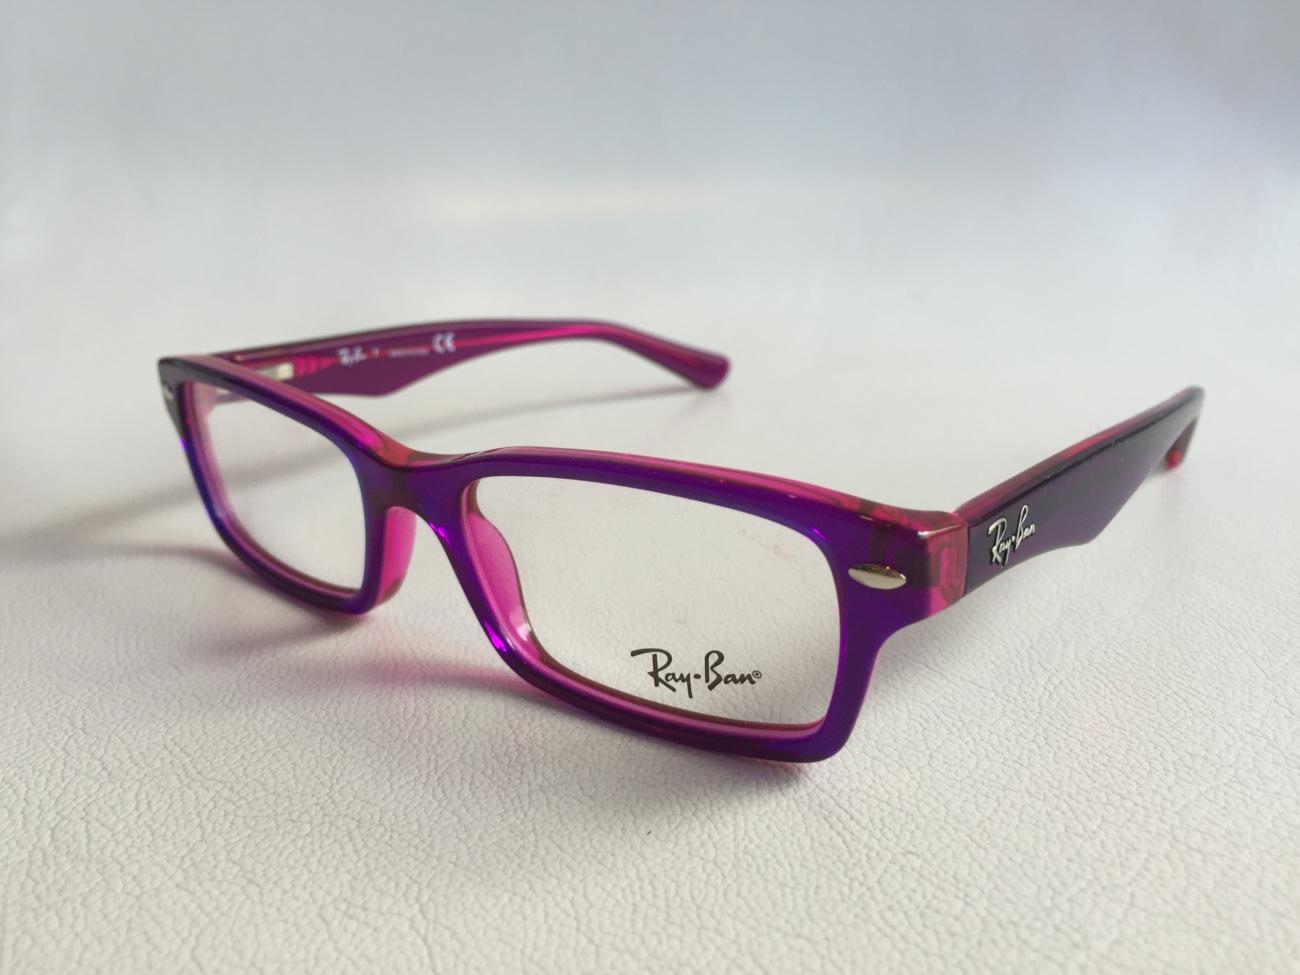 222 Products in RayBan Eyeglass Frames  OpticsPlanet